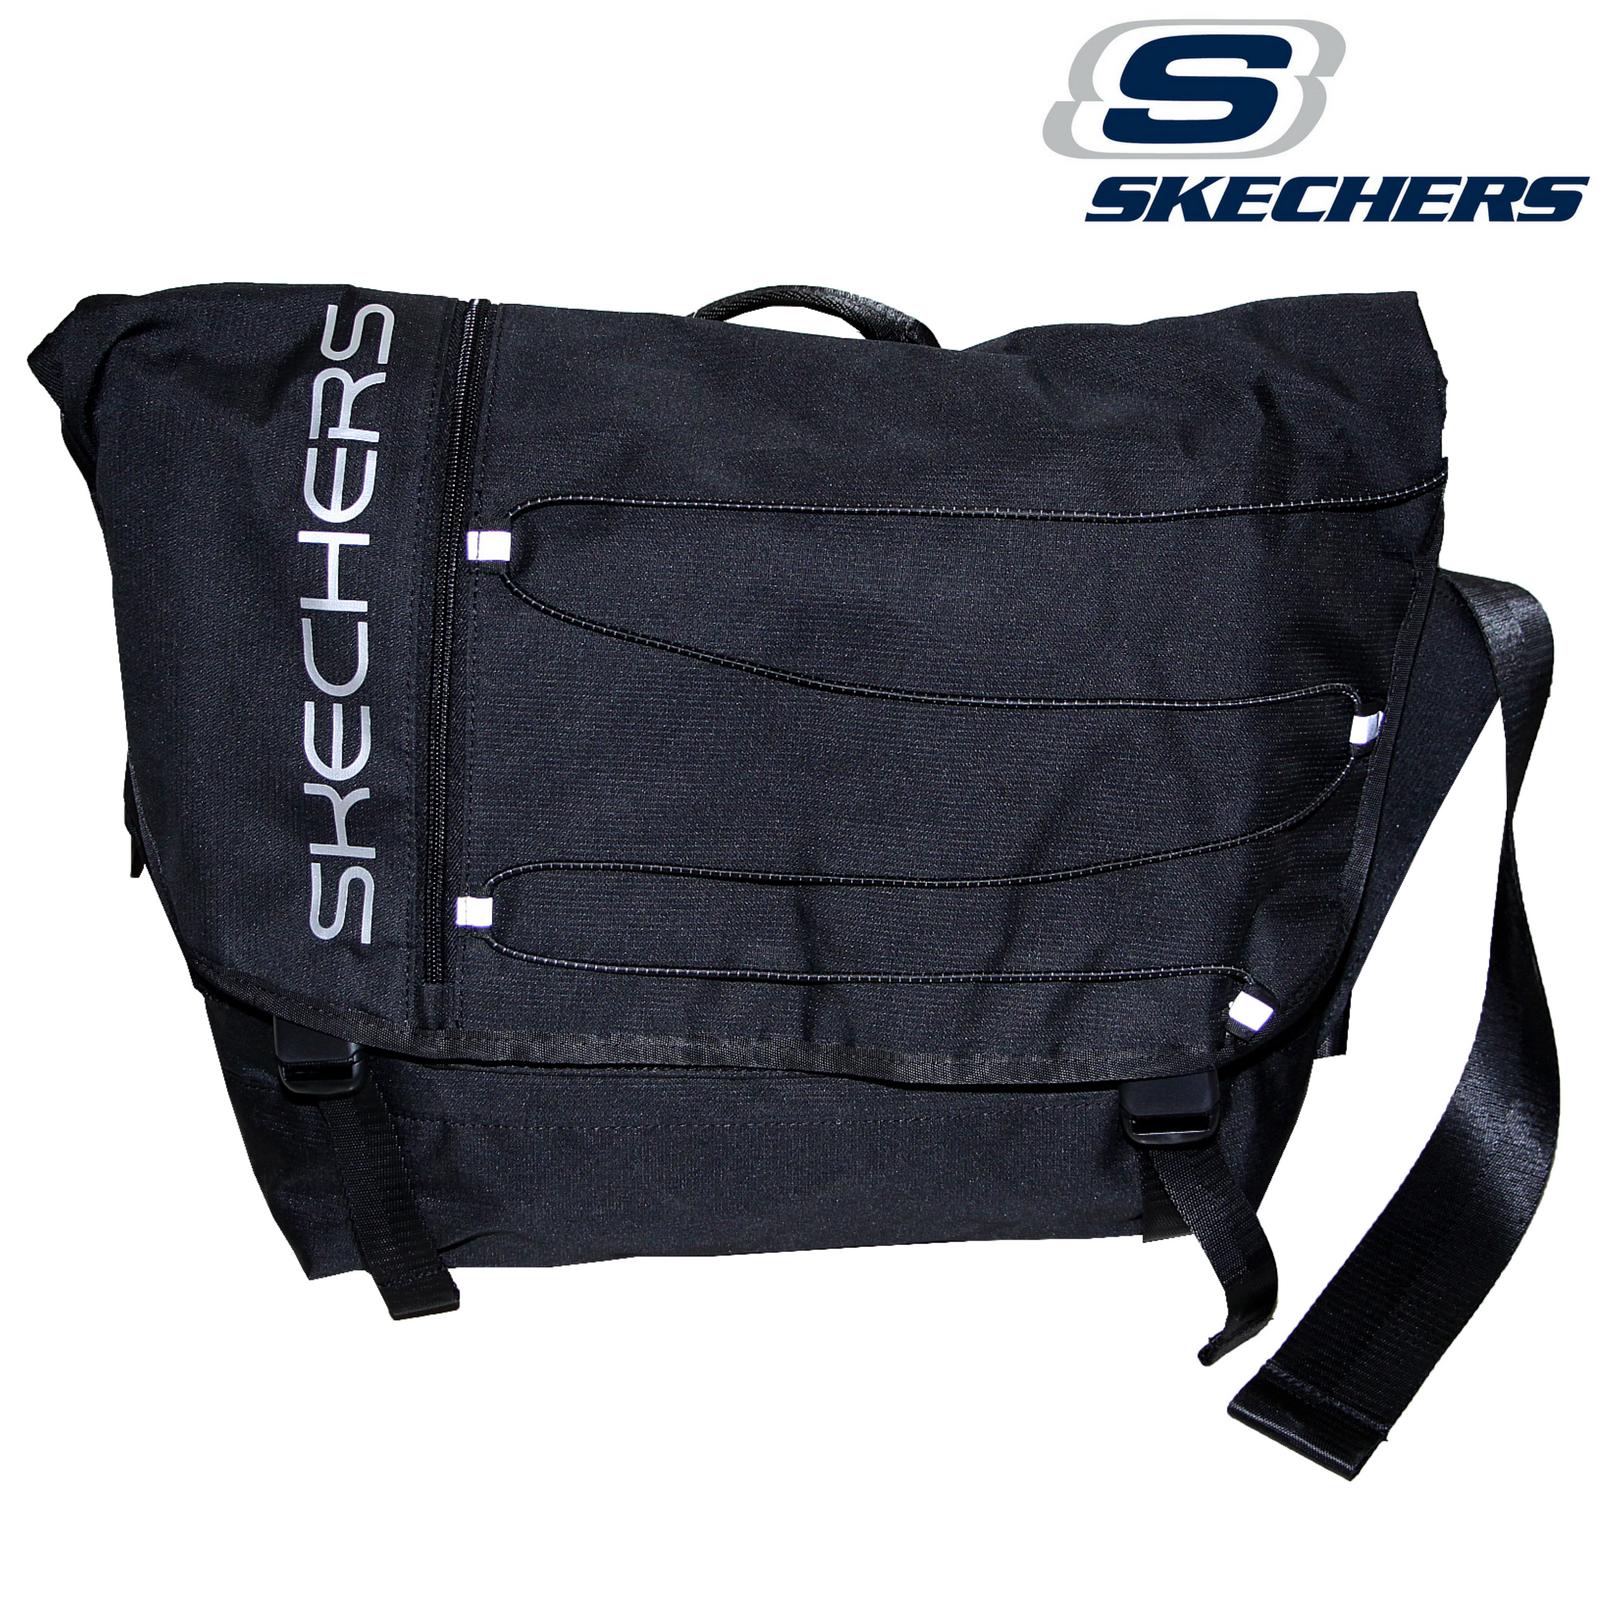 Skechers Santa Monica 2 Section Backpack w Laptop Pocket Travel Bag Black